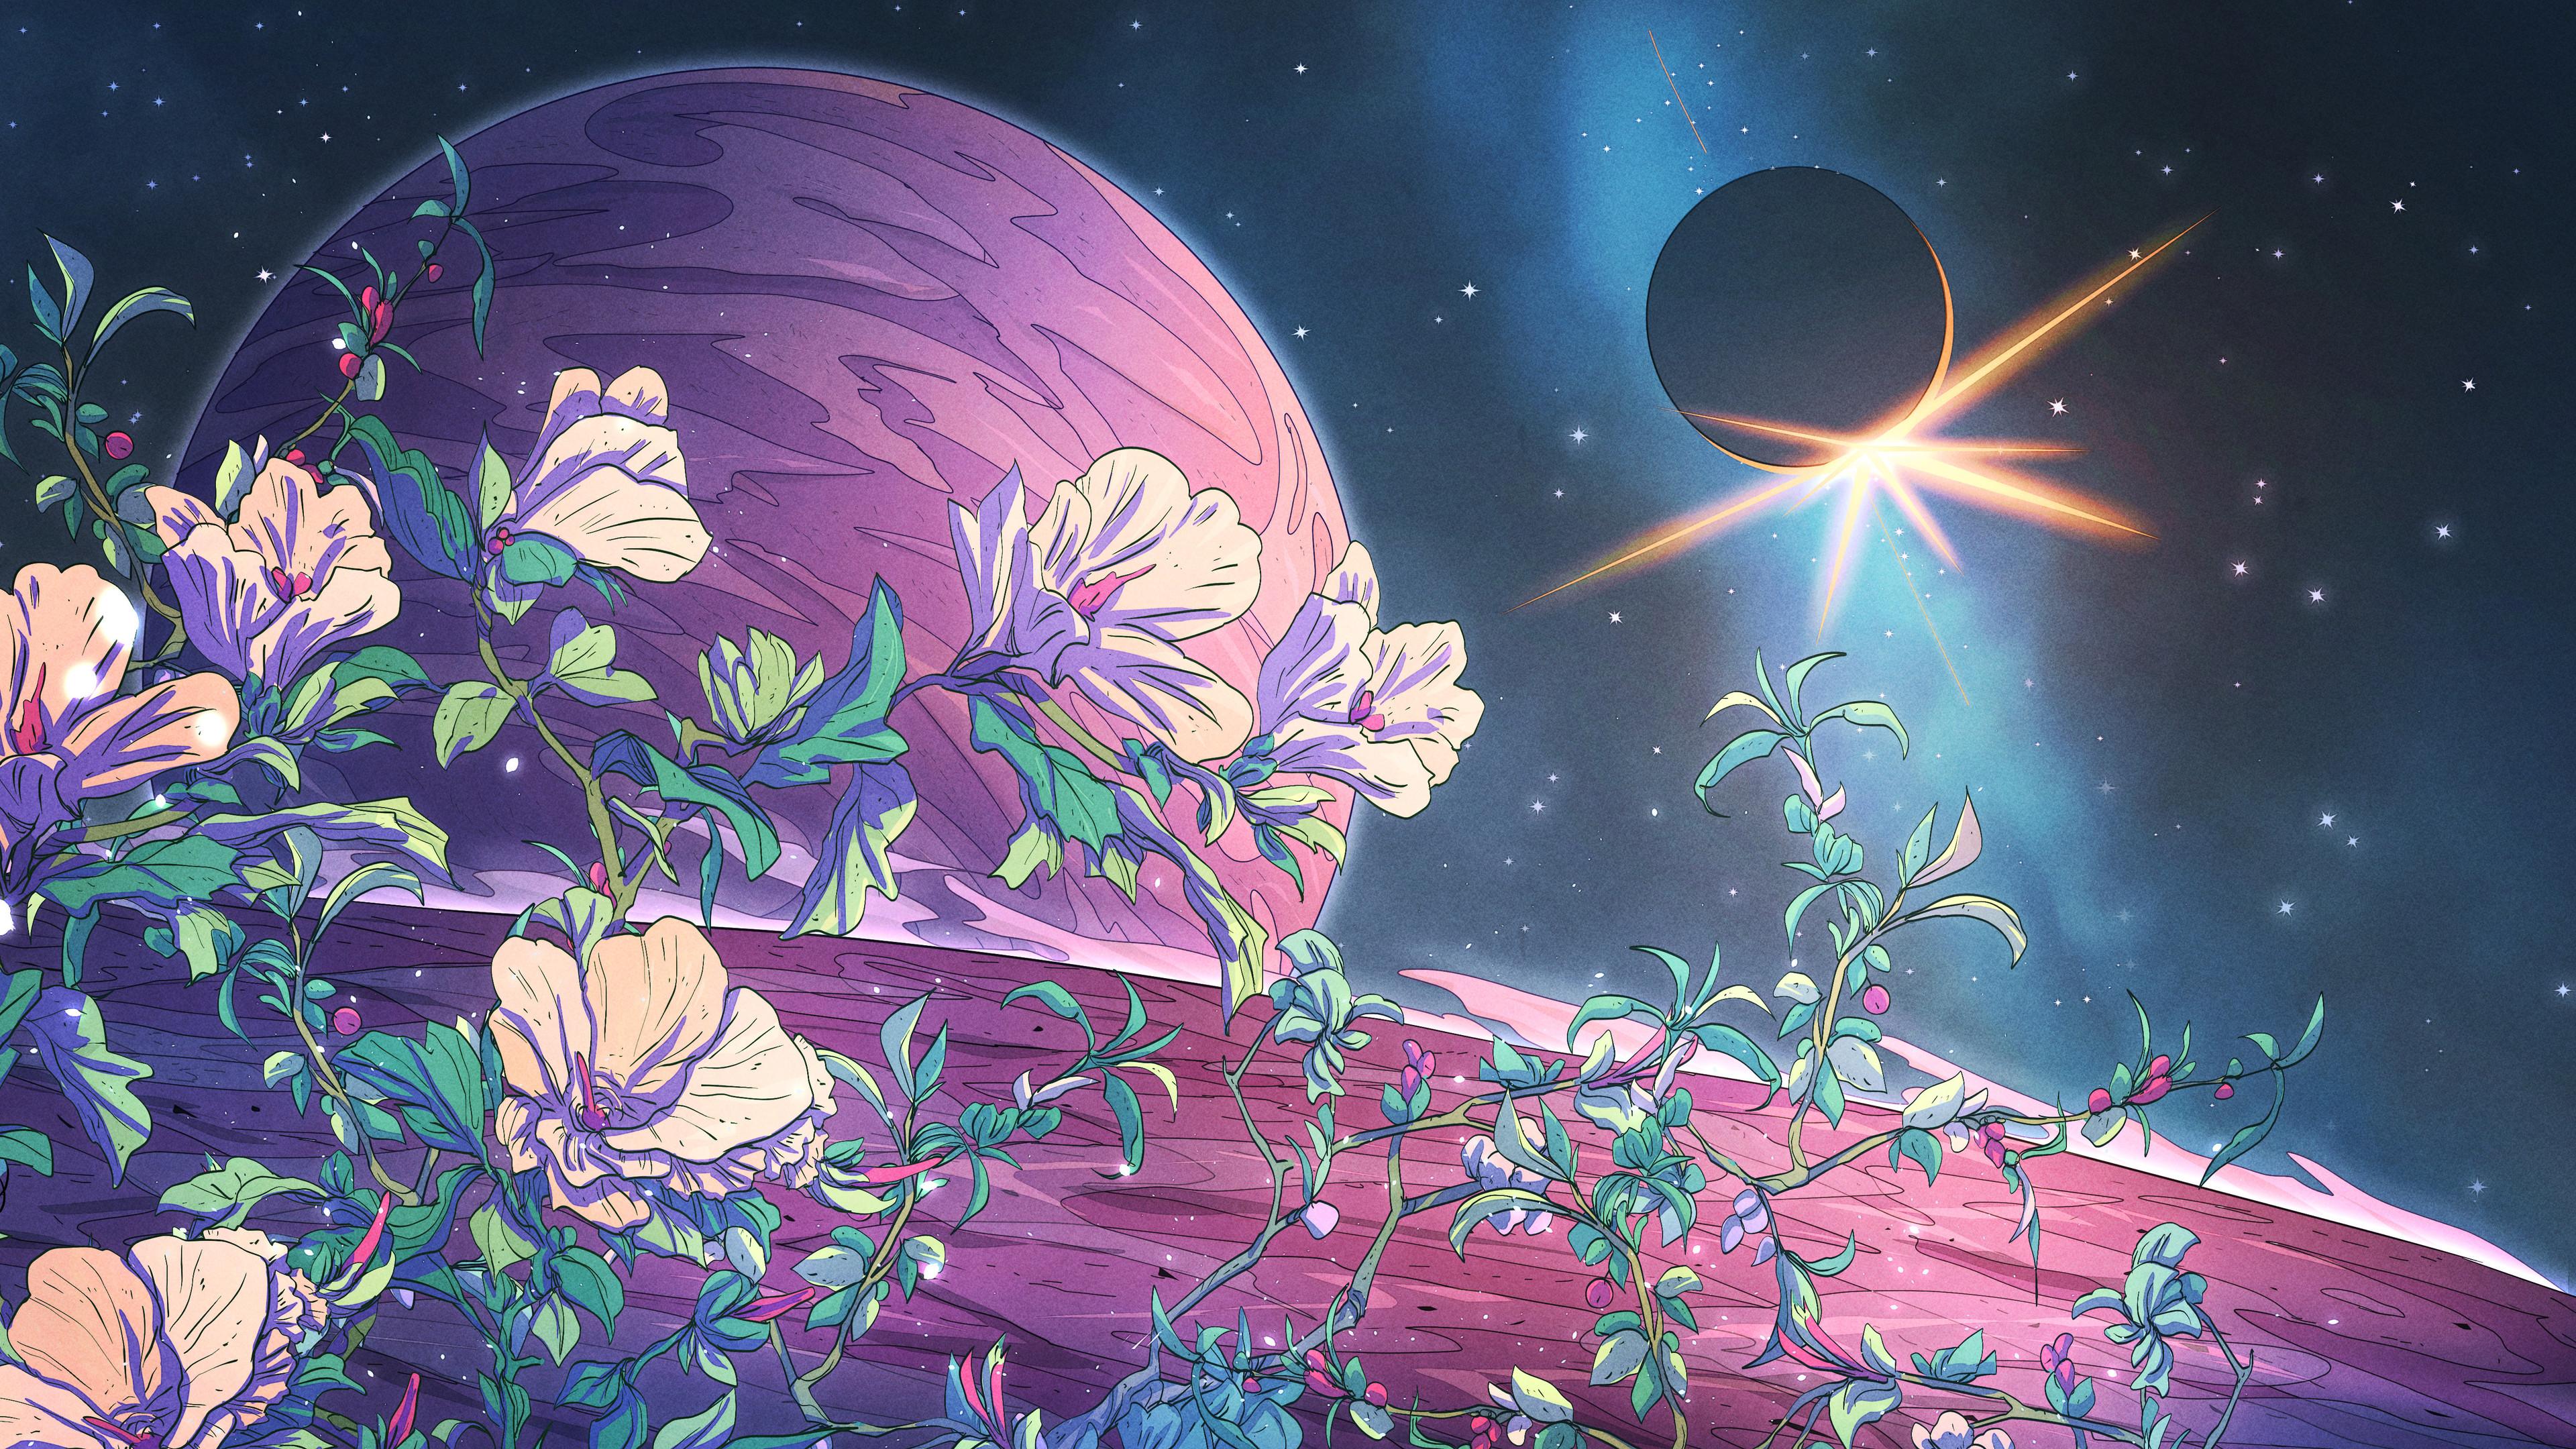 General 3840x2160 Christian Benavides digital art fantasy art flowers space eclipse  planet stars